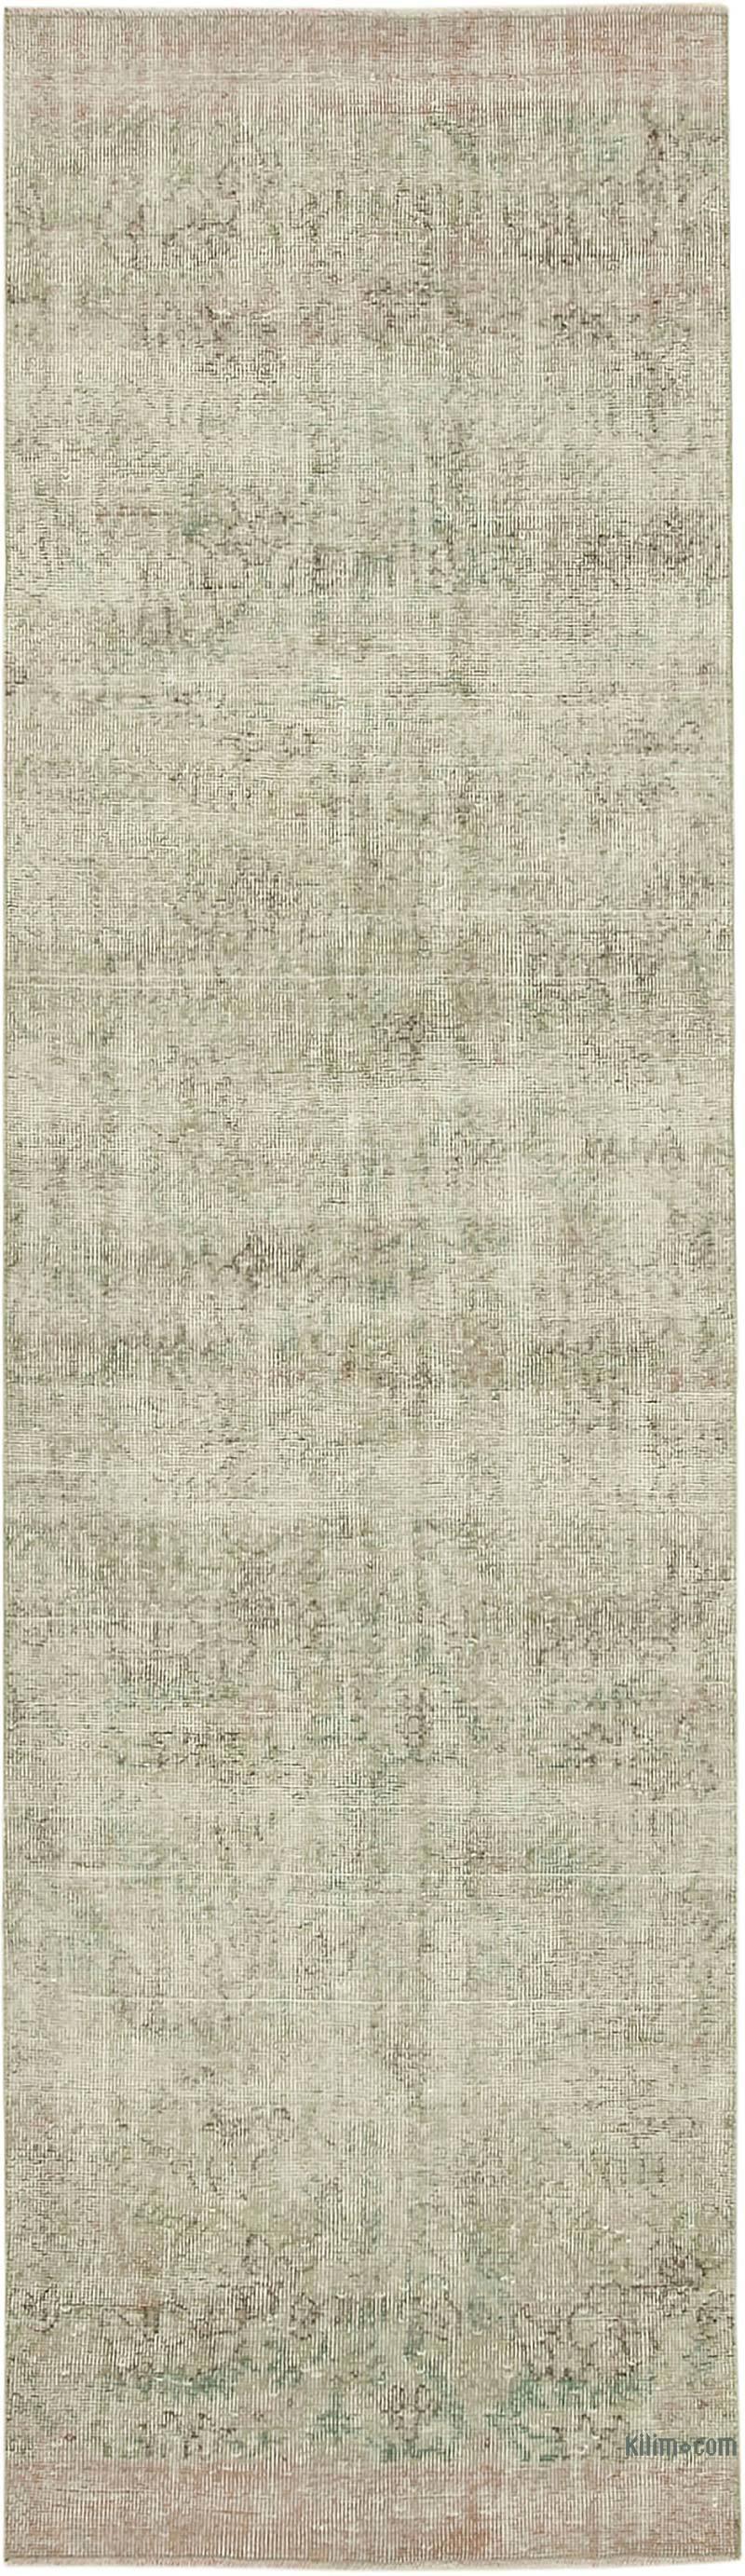 Bej Boyalı El Dokuma Vintage Halı Yolluk - 91 cm x 318 cm - K0054585